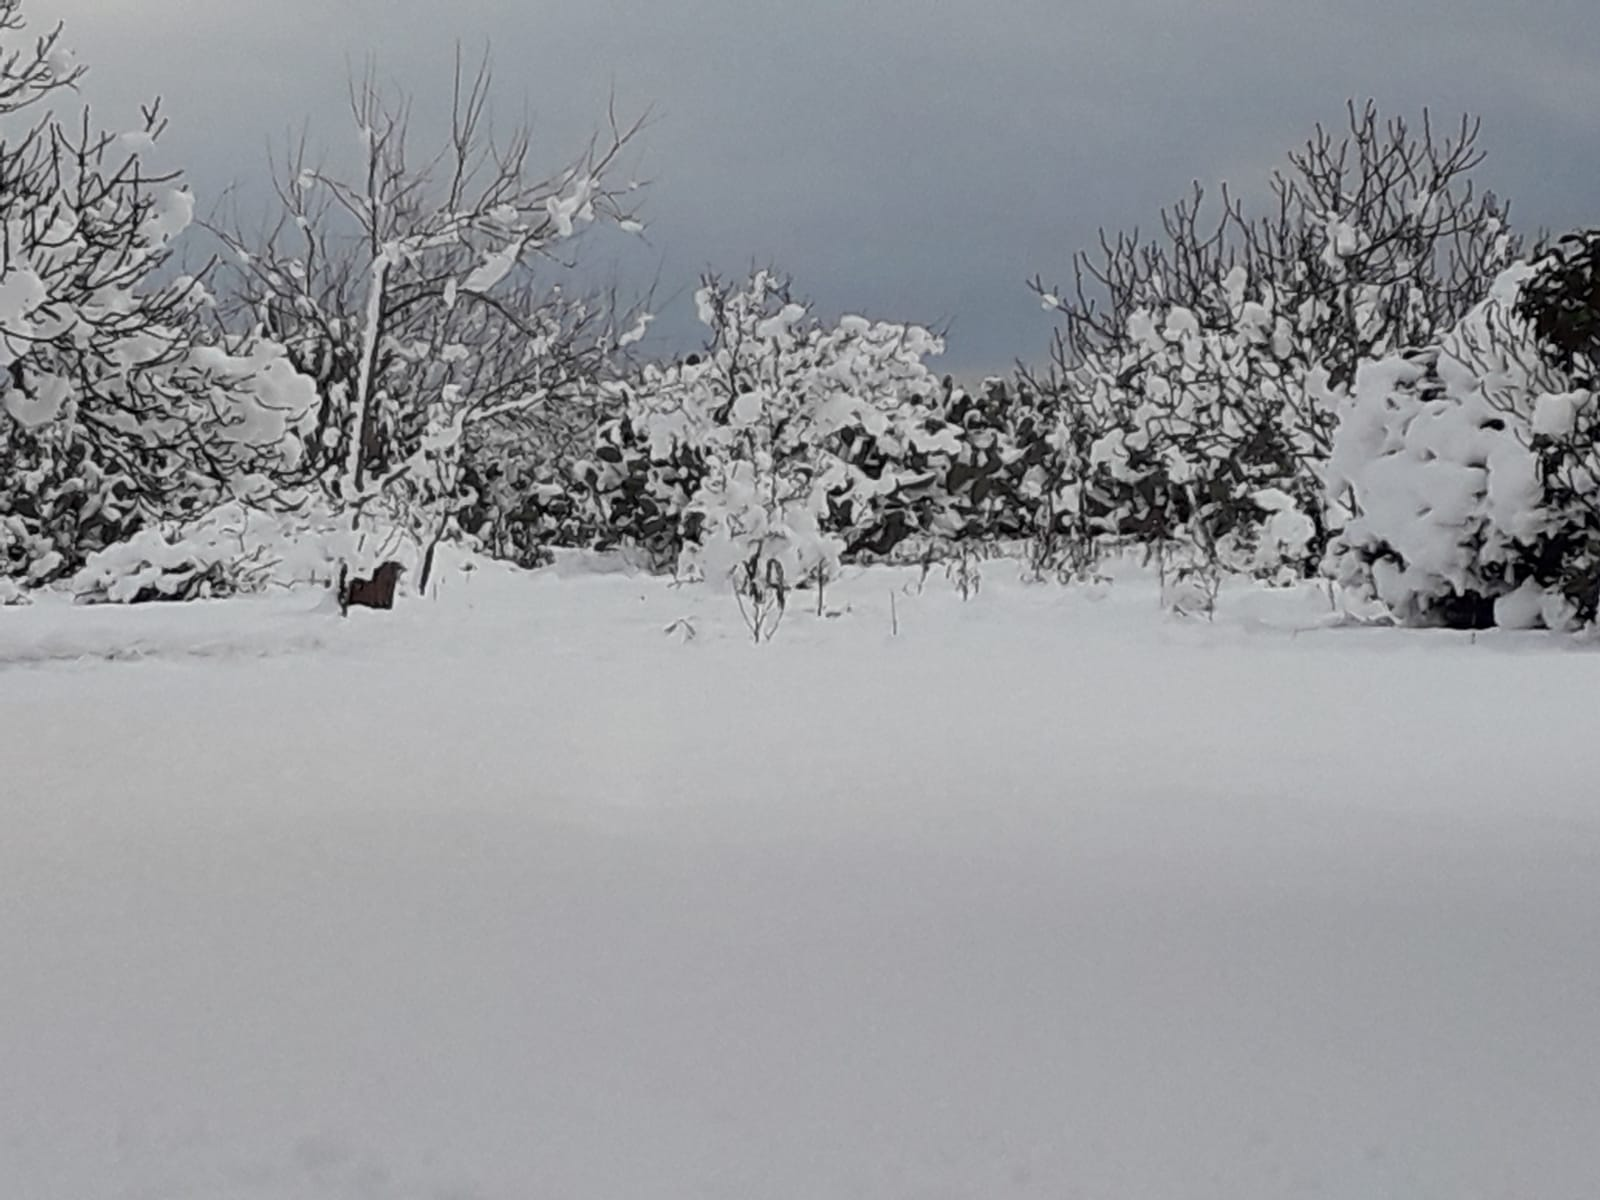 Galleria fotografica neve 03-04 gennaio 2019-img-20190105-wa0005.jpg